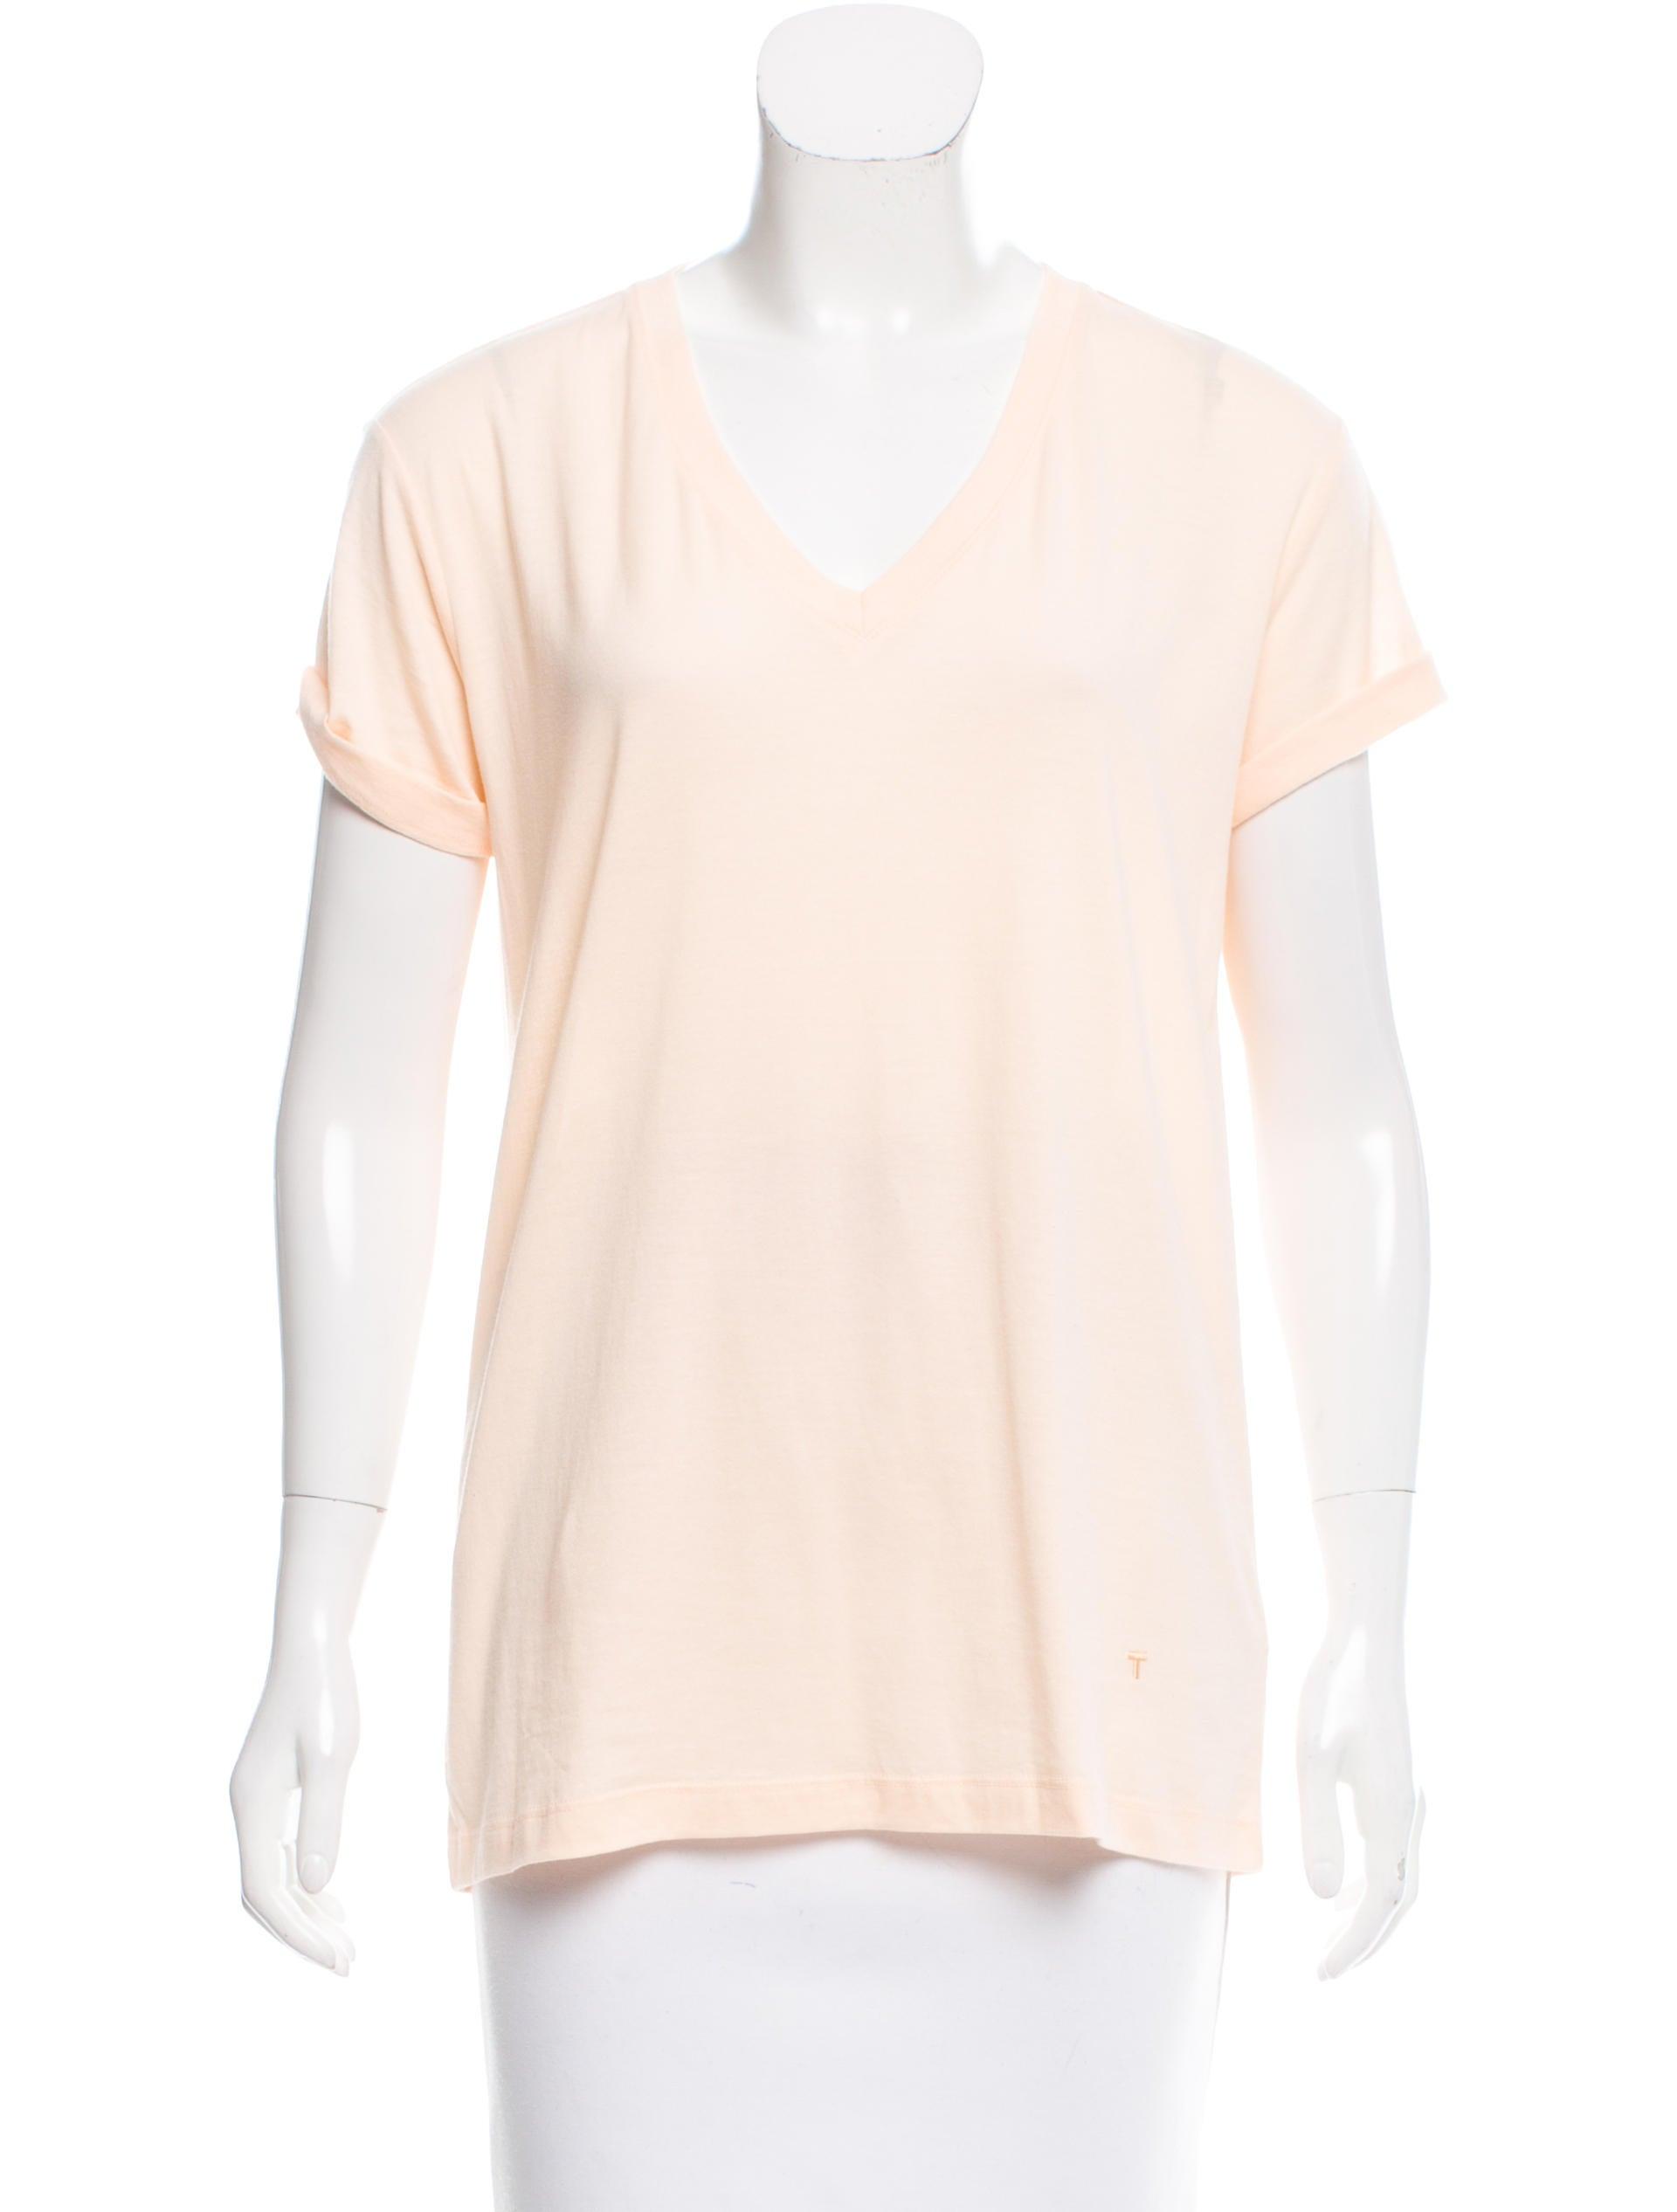 T by alexander wang casual v neck t shirt clothing for Alexander wang t shirt women